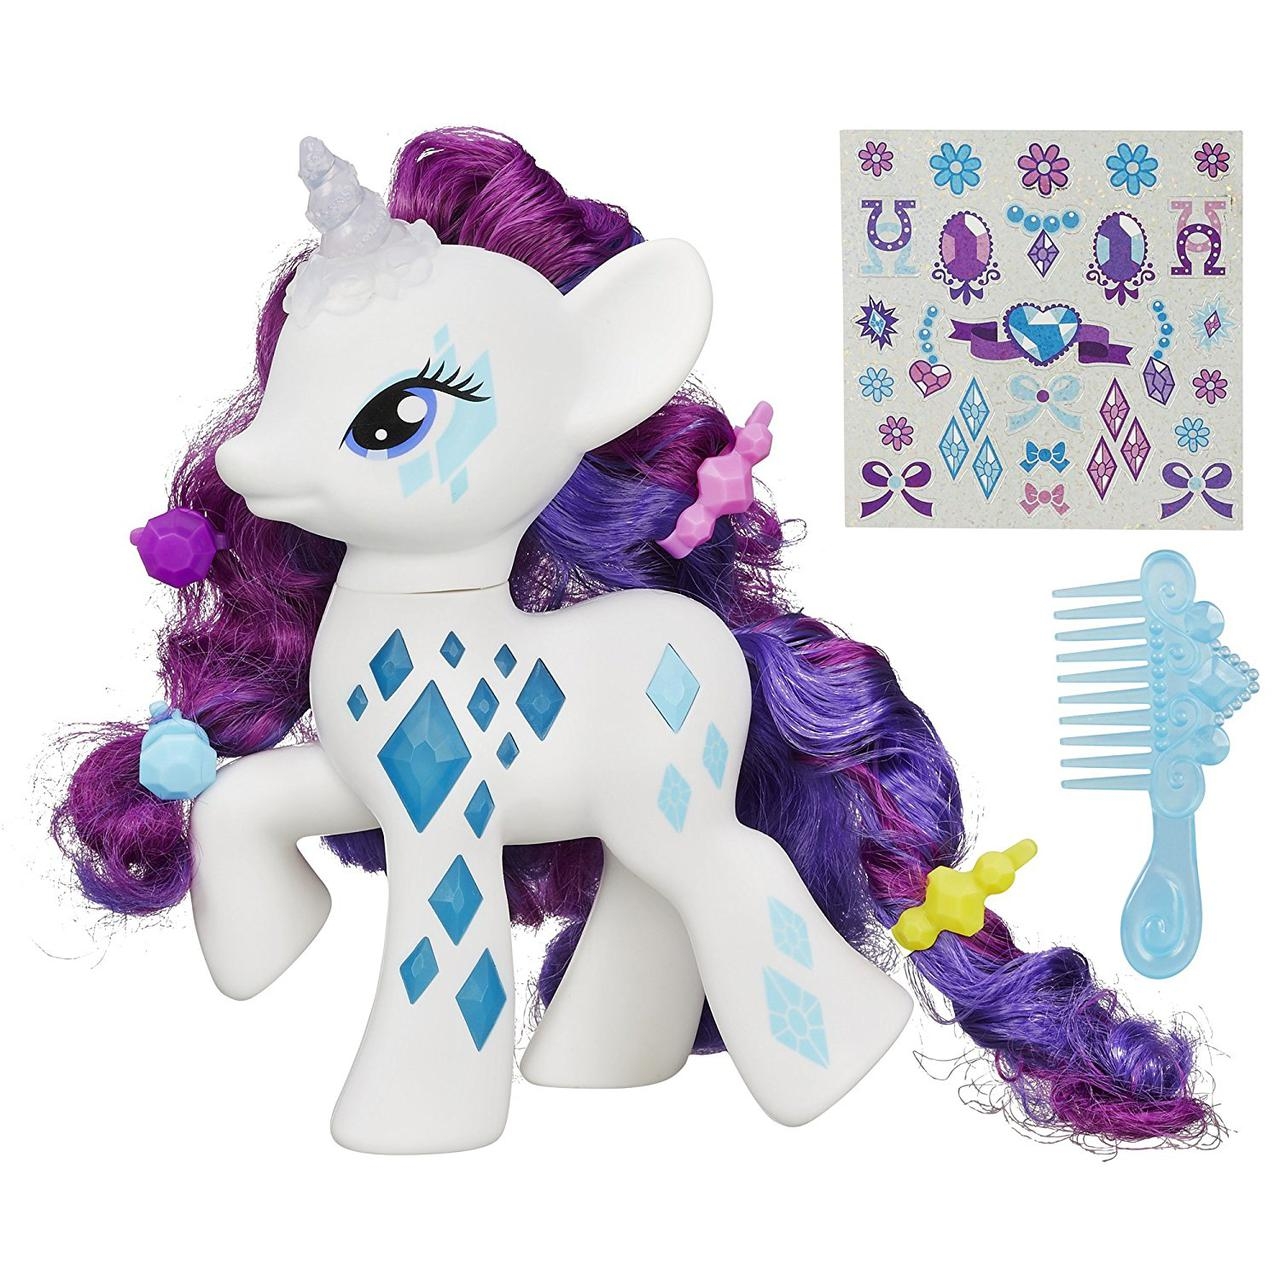 Май Литл Пони Светящаяся Модница Рарити Гламурный блеск My Little Pony Friendship Magic Glamour Glow Rarity